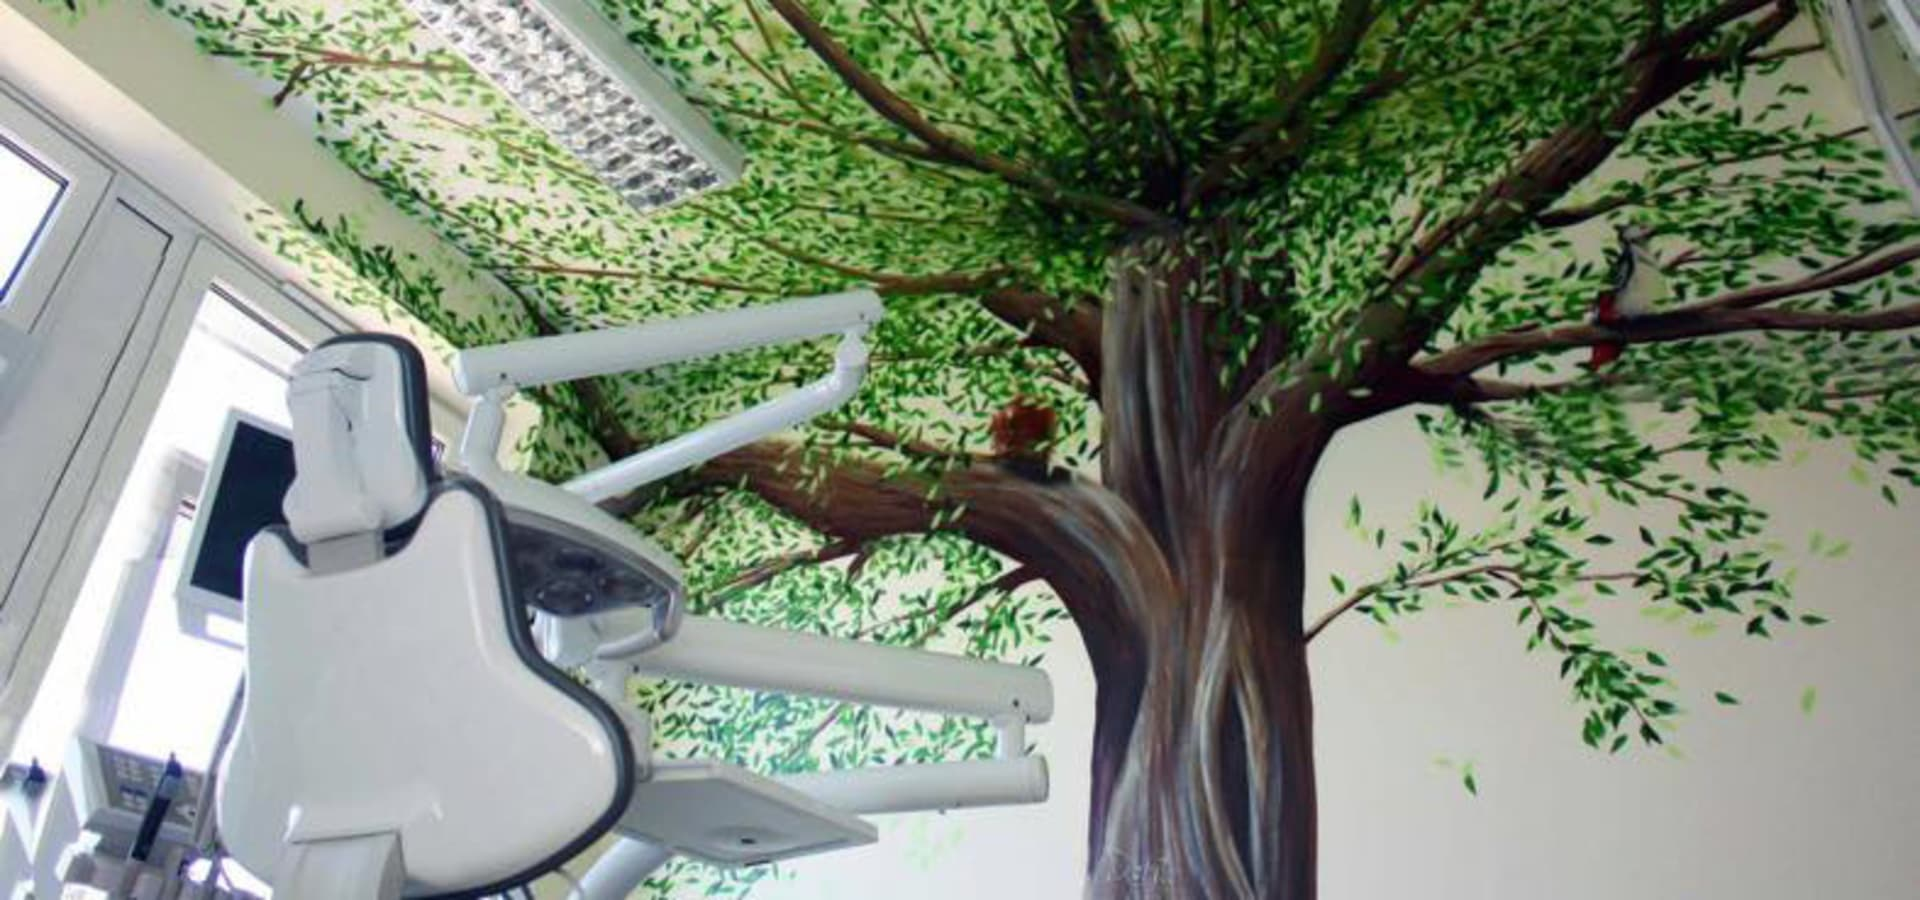 Wandmalerei Kinderzimmer Baum - Caseconrad.com